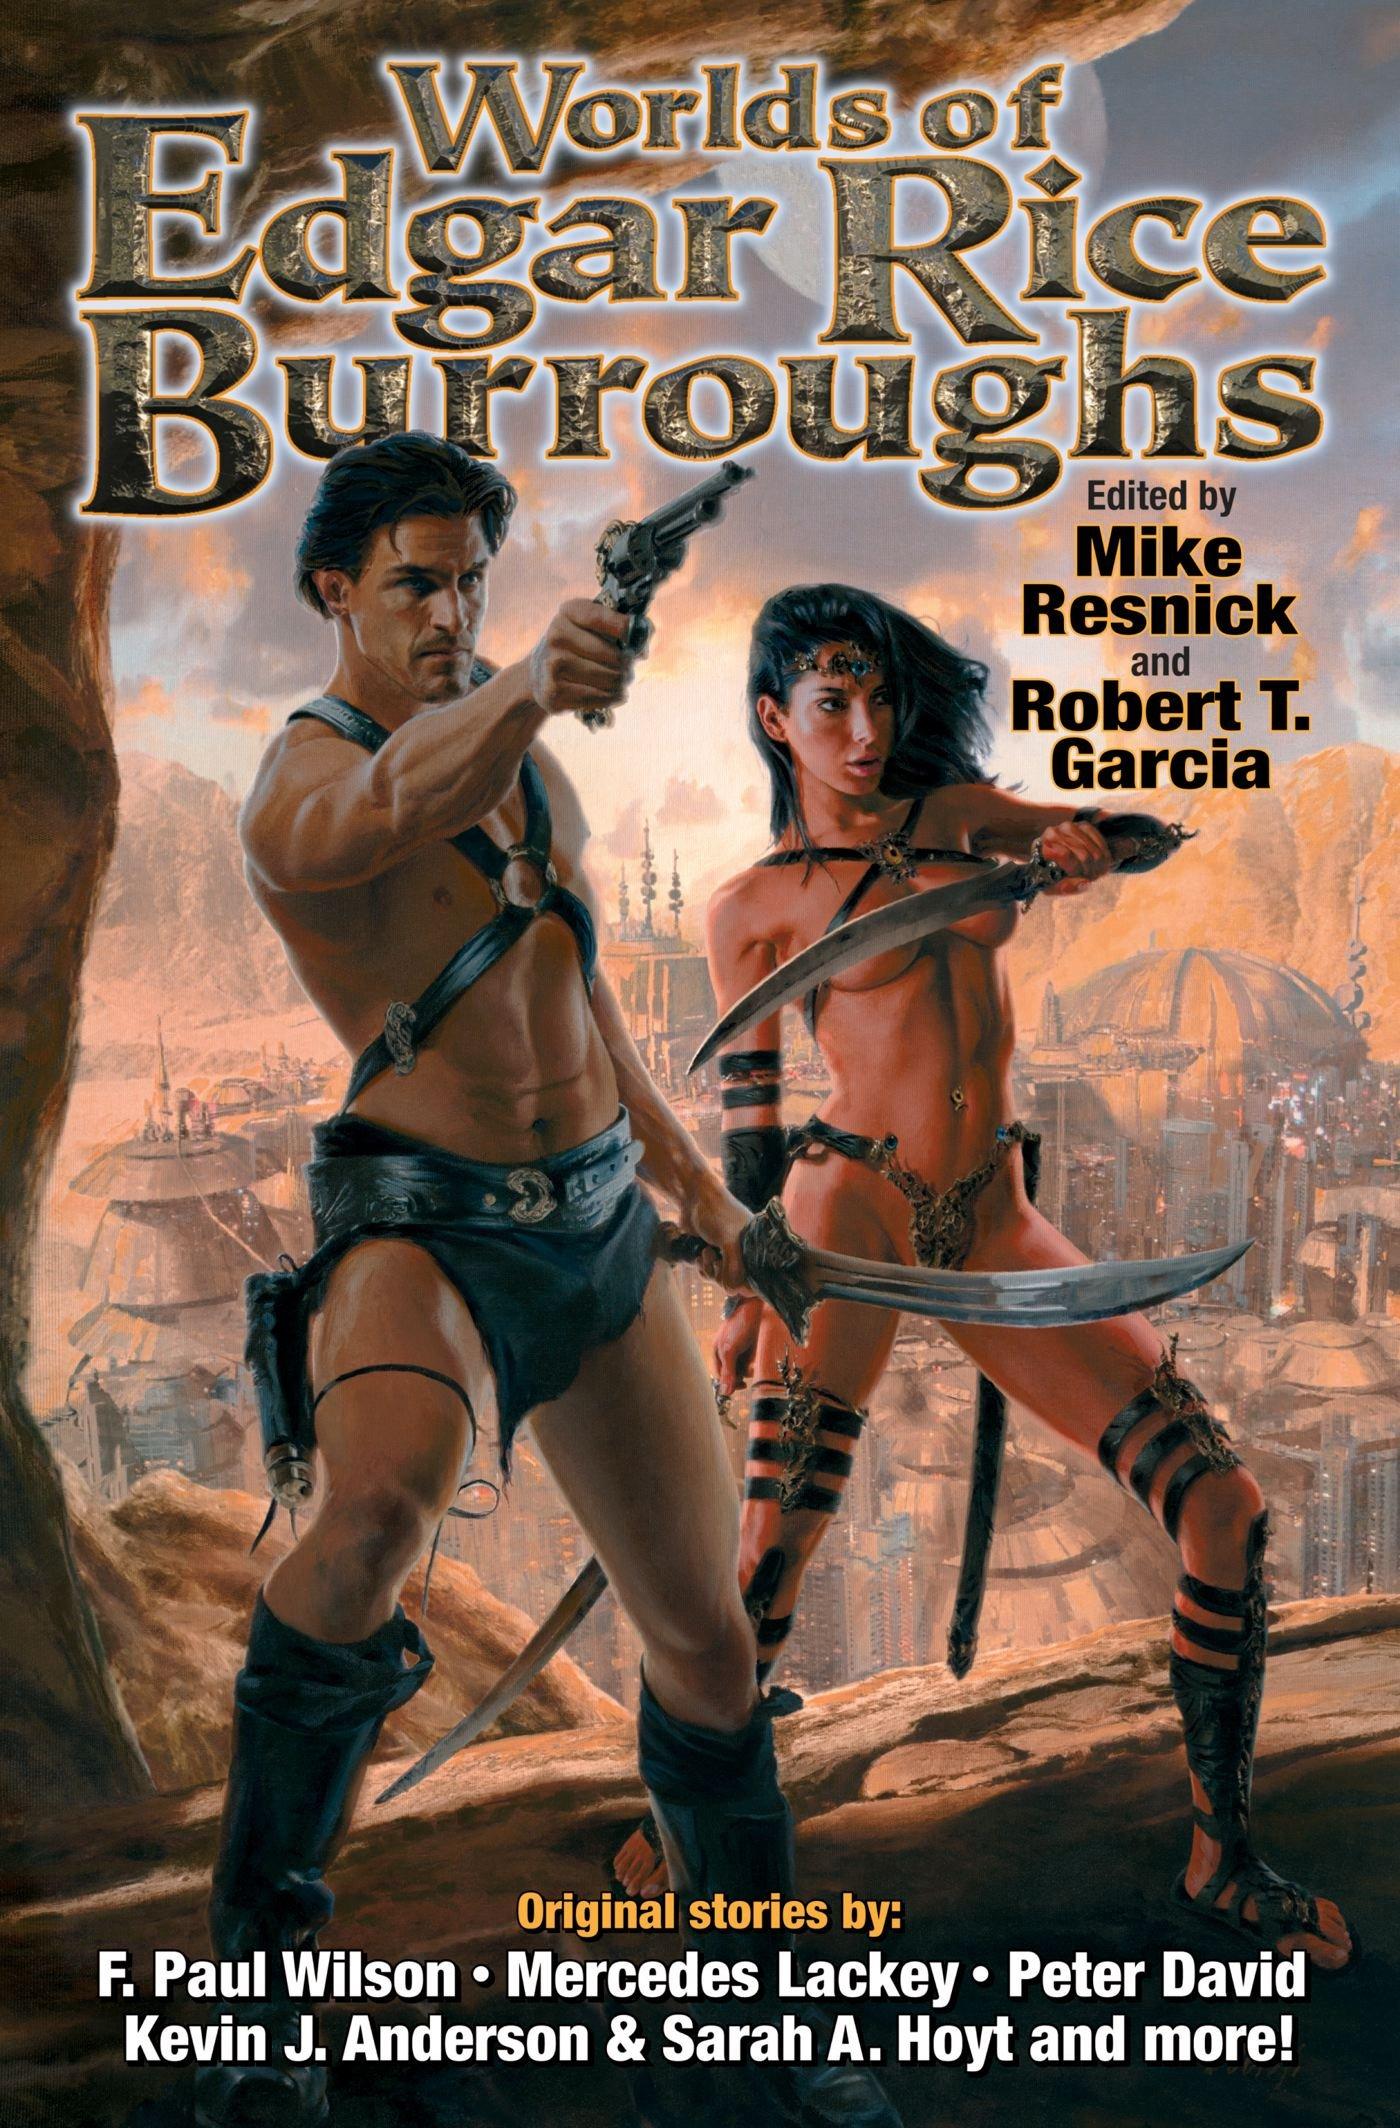 Worlds of Edgar Rice Burroughs